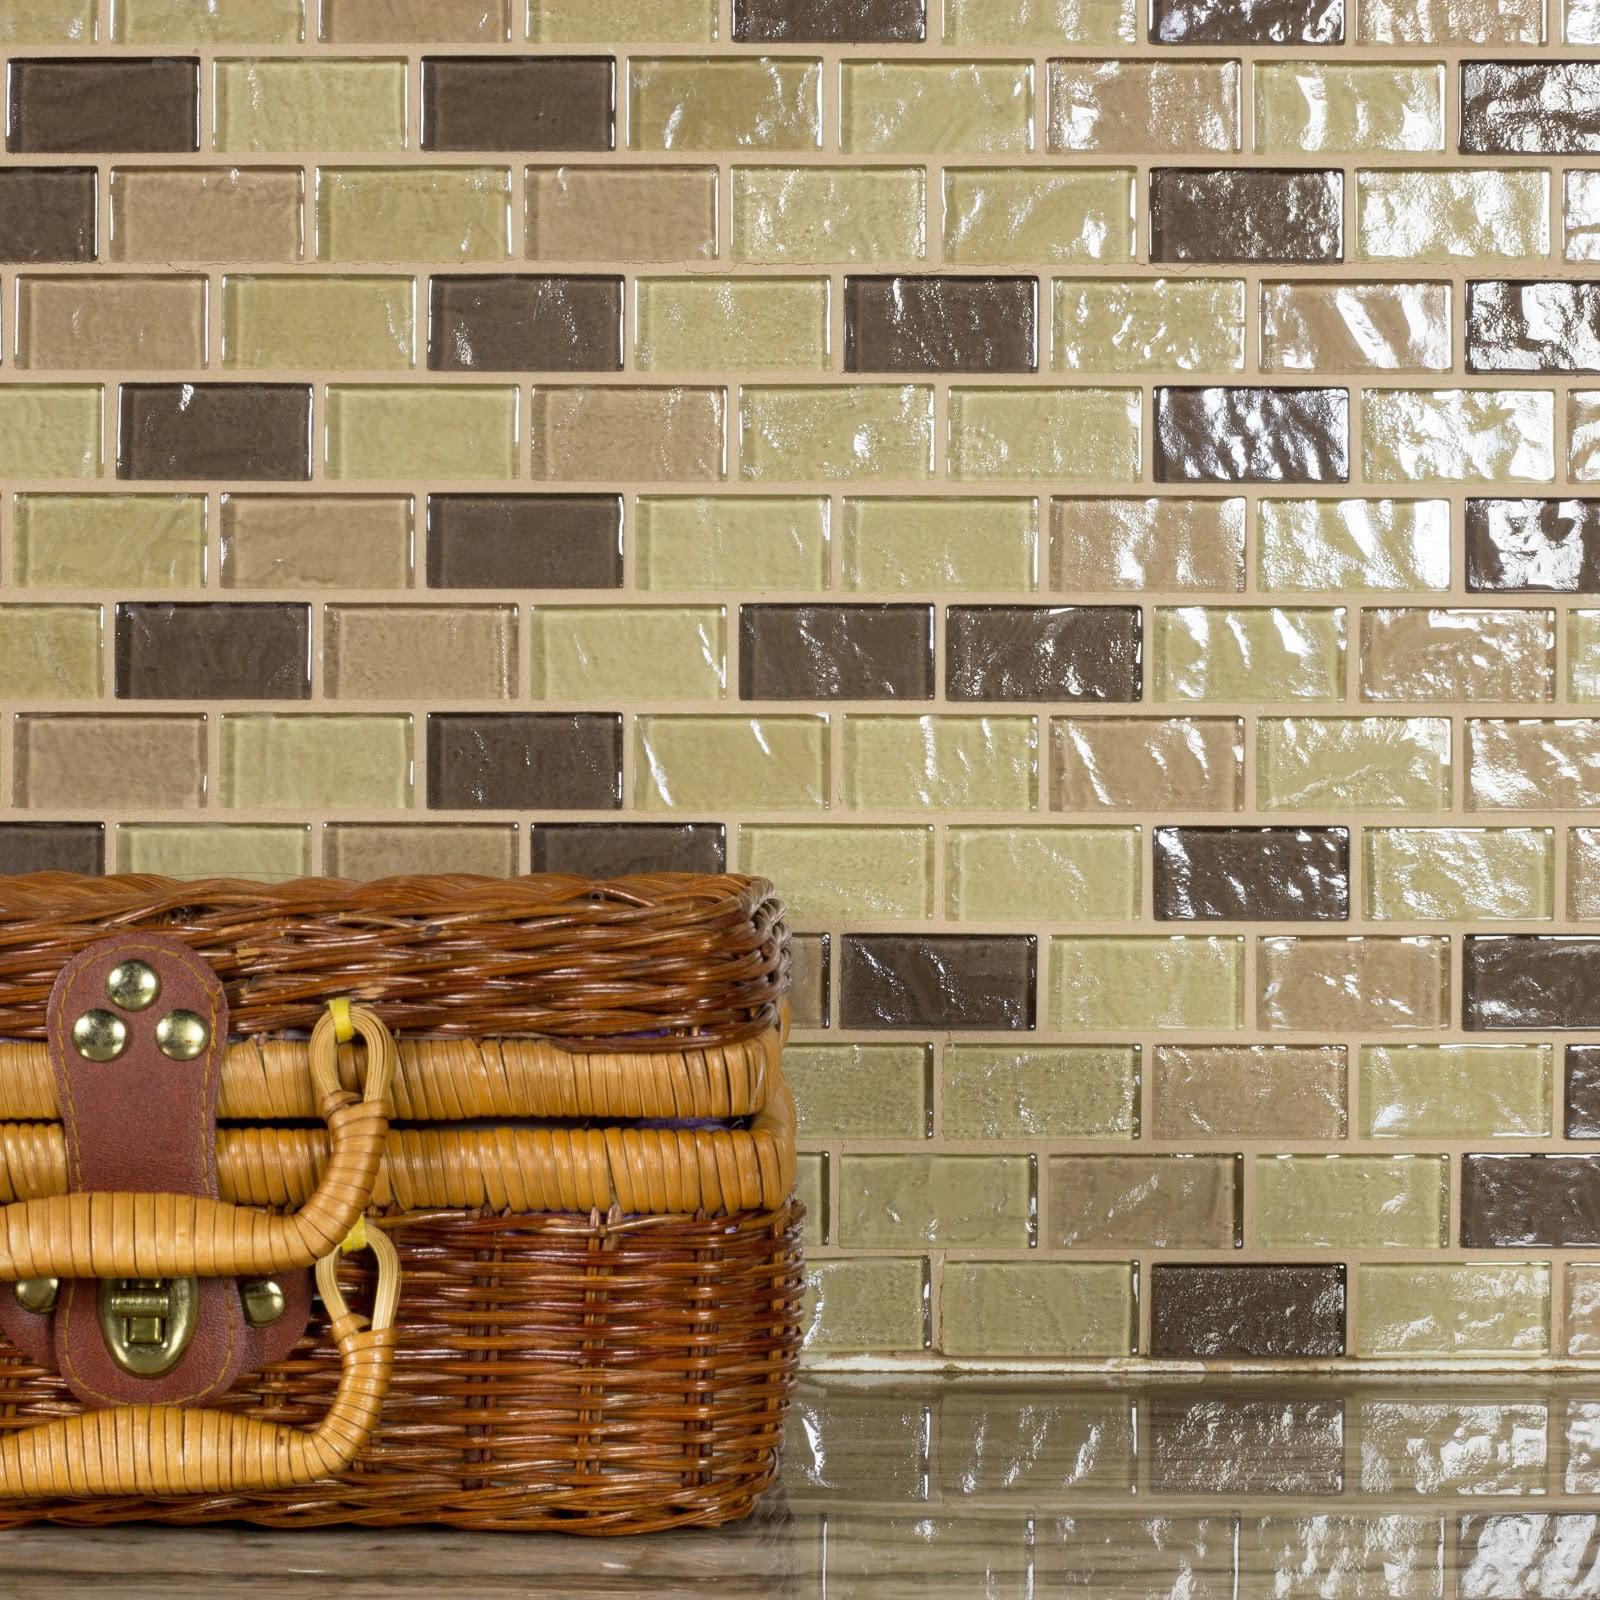 "Abolos- Geo 1"" x 2"" Glass Mosaic Backsplash Tile in Light Brown (4.9sqft / 5pc Box)"